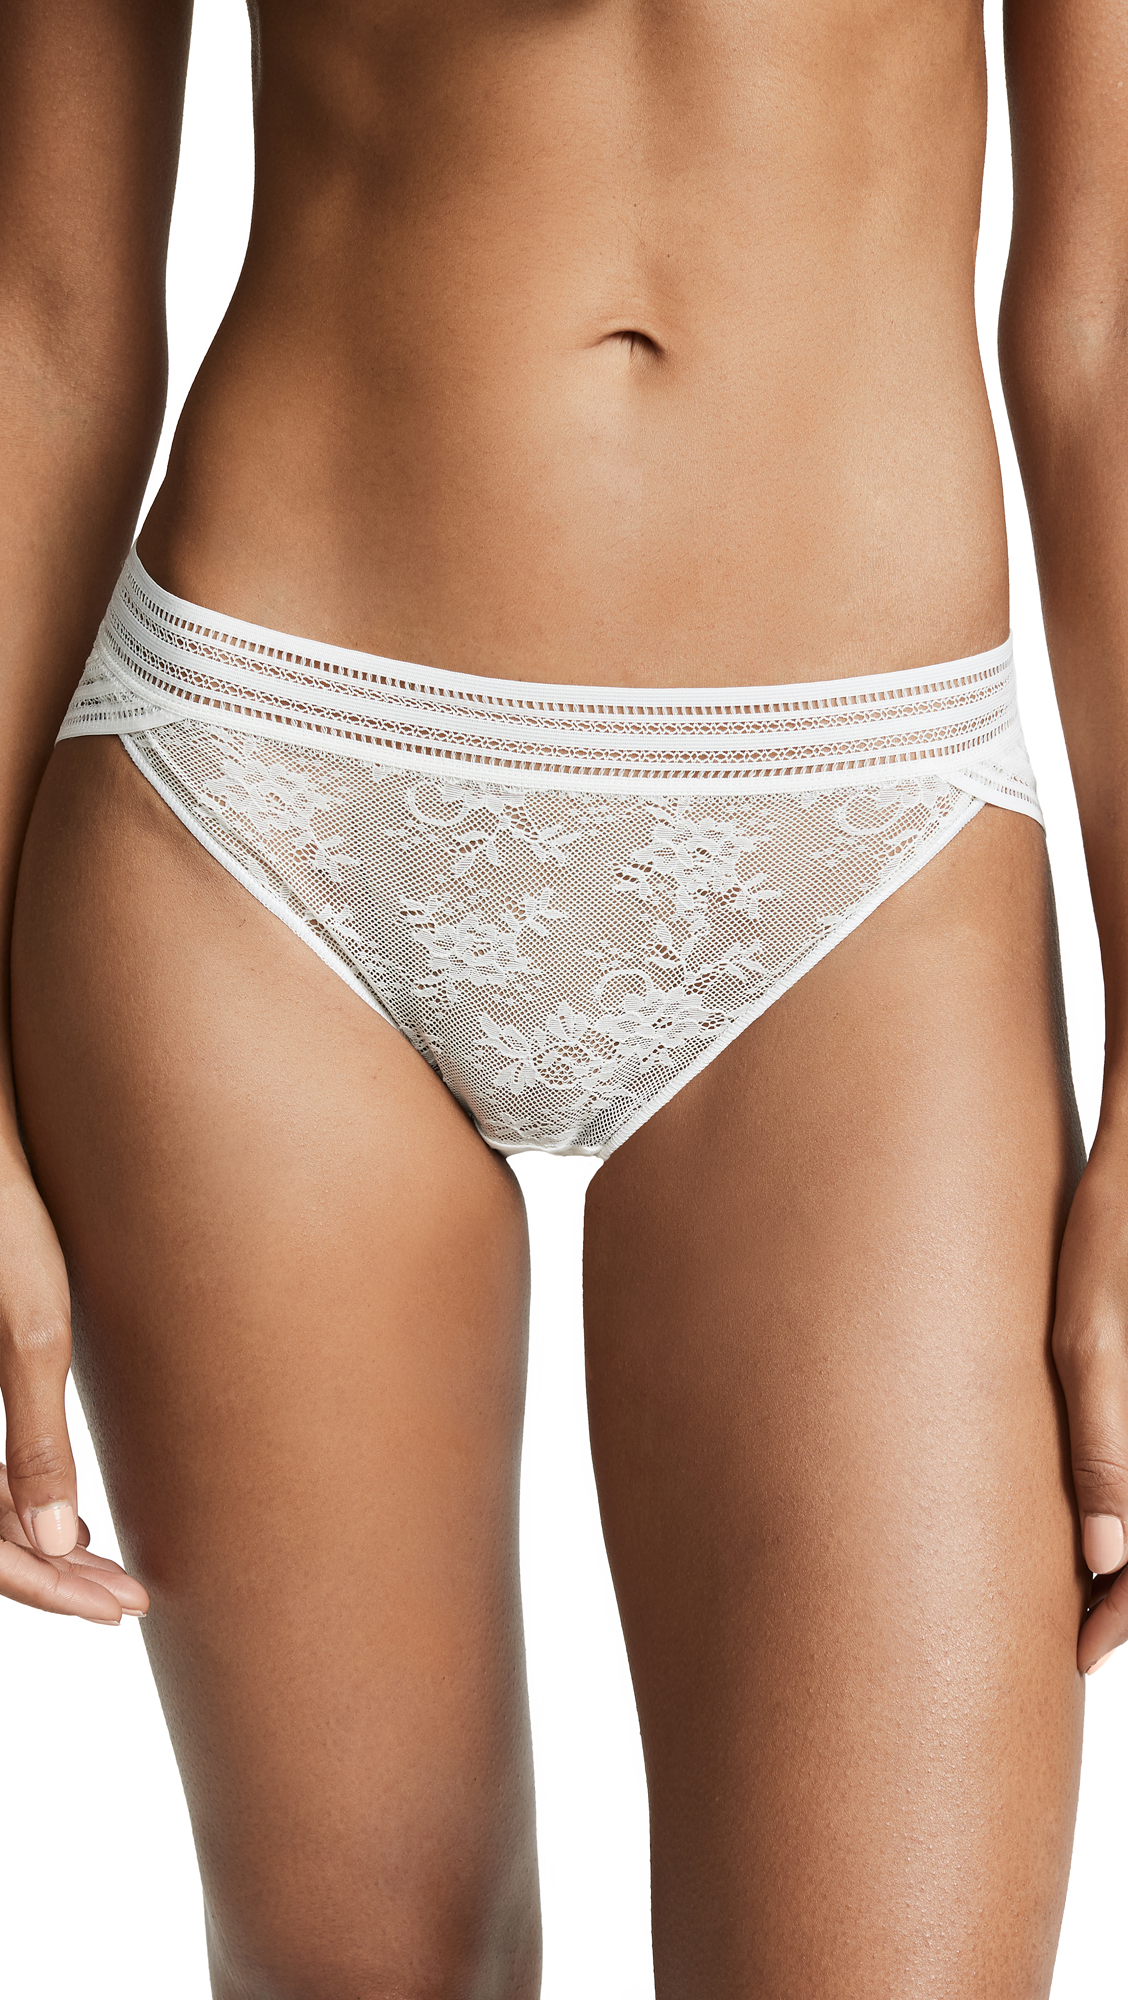 Maison Lejaby Miss Lejaby Bikini Panty